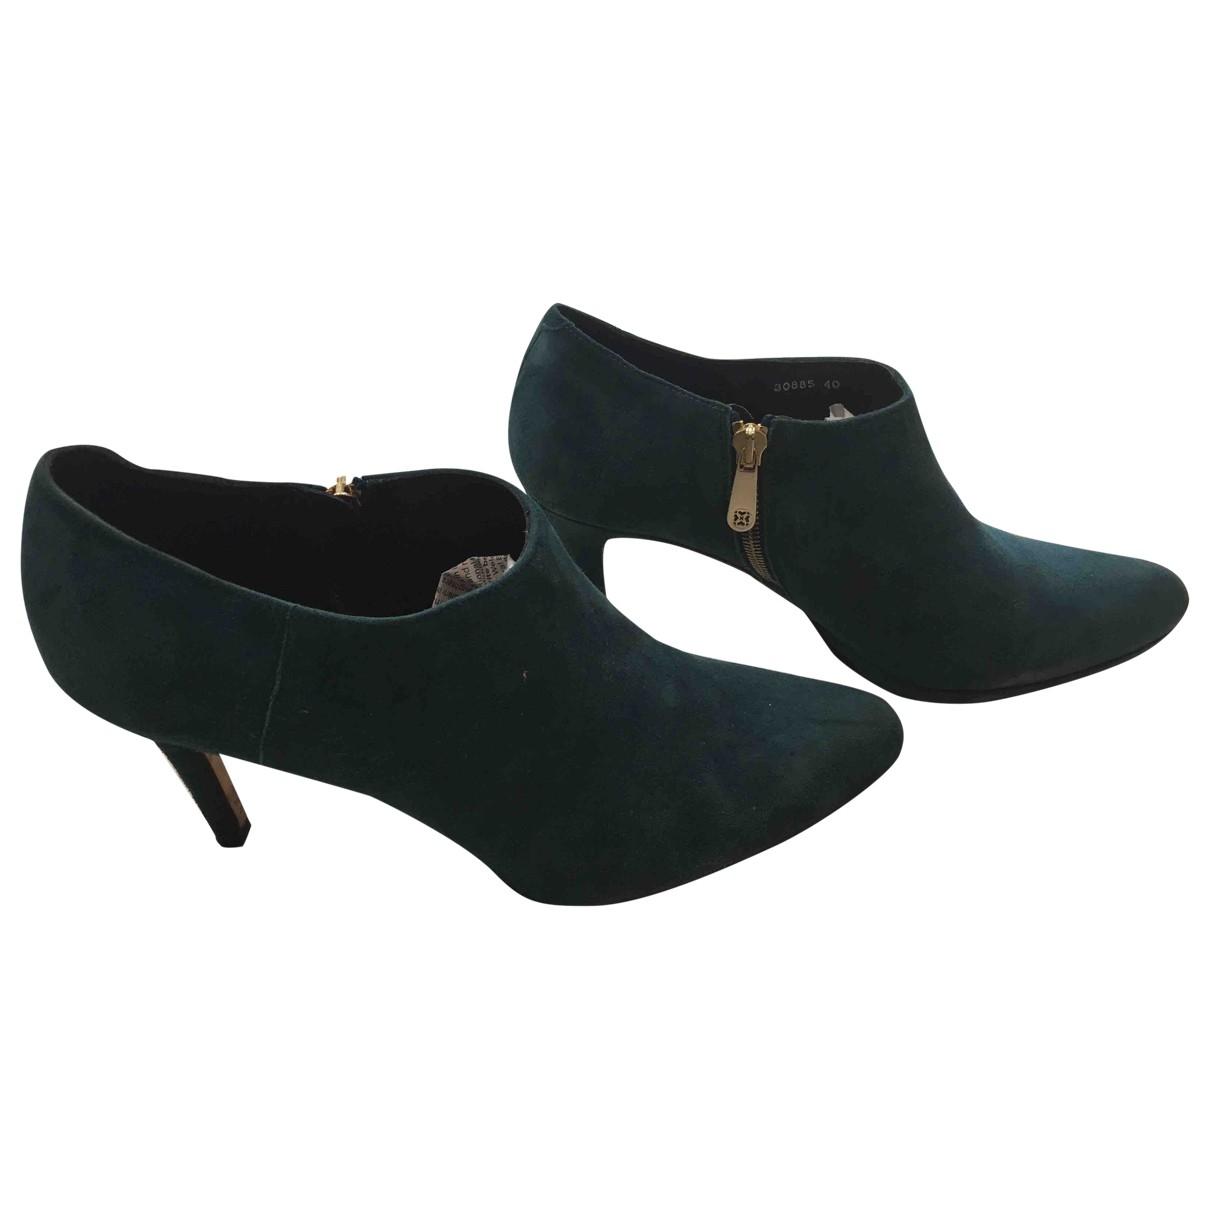 Lk Bennett - Bottes   pour femme en suede - bleu